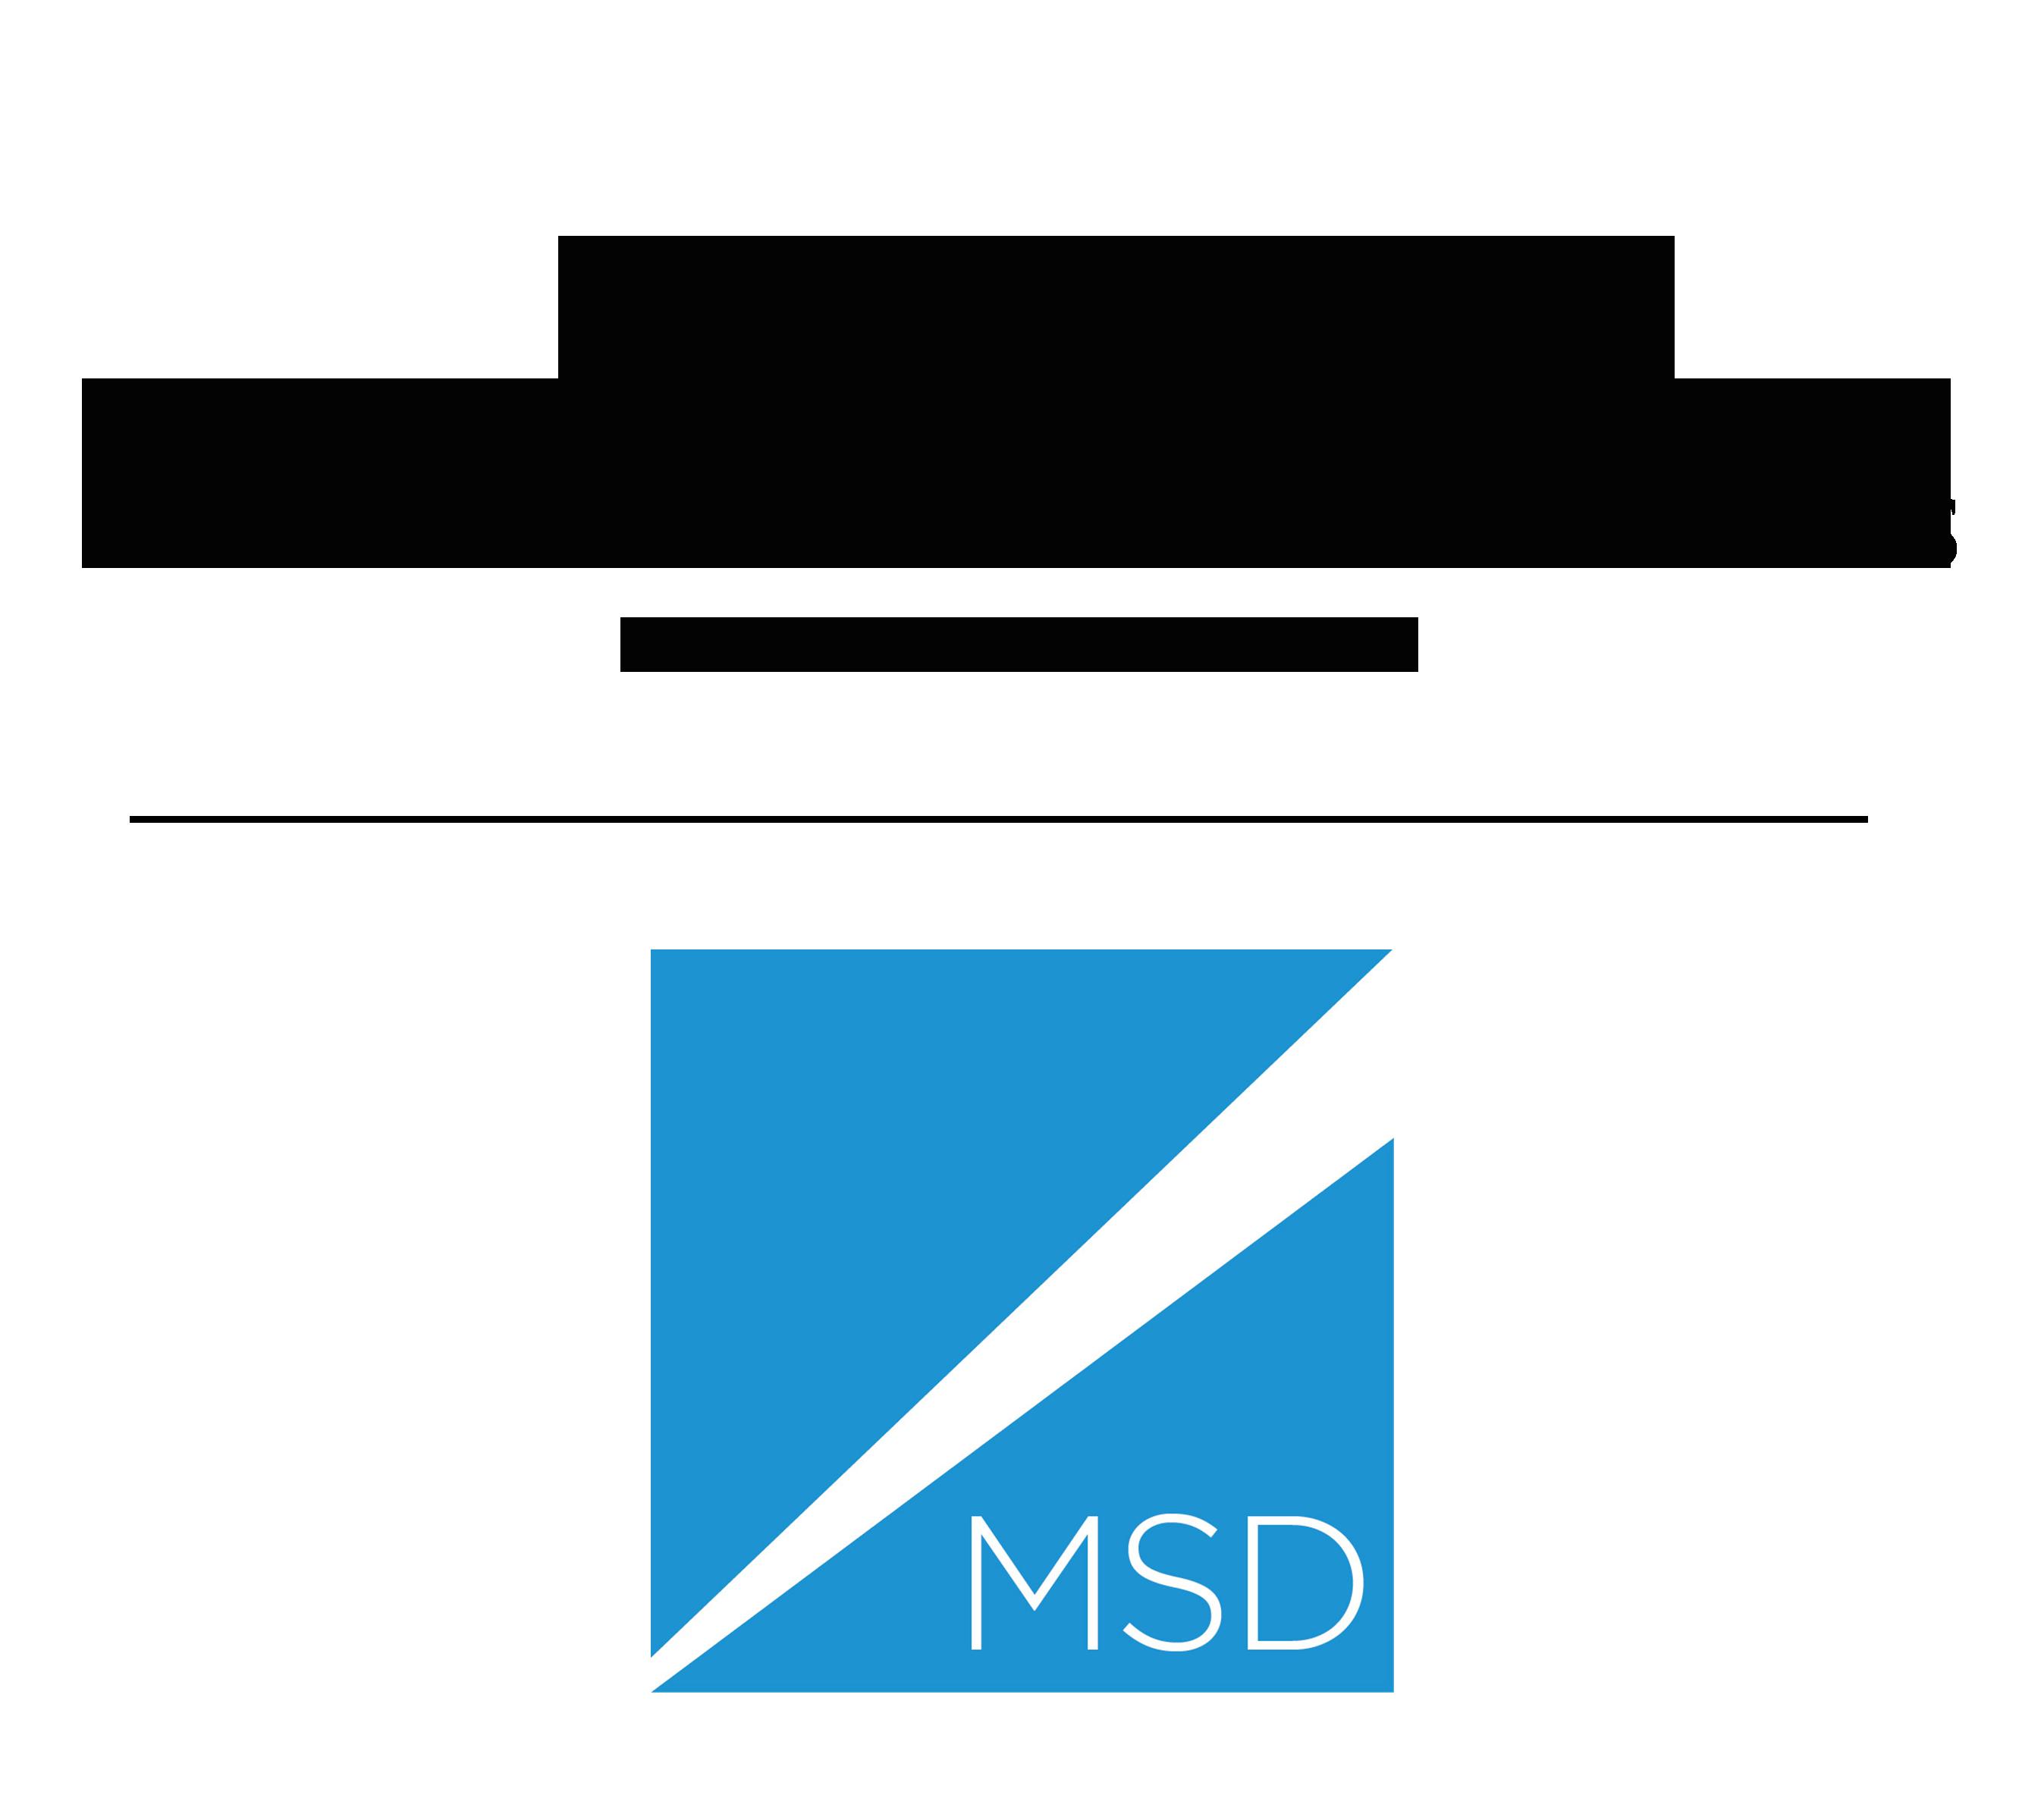 Fairmont/MSD logo